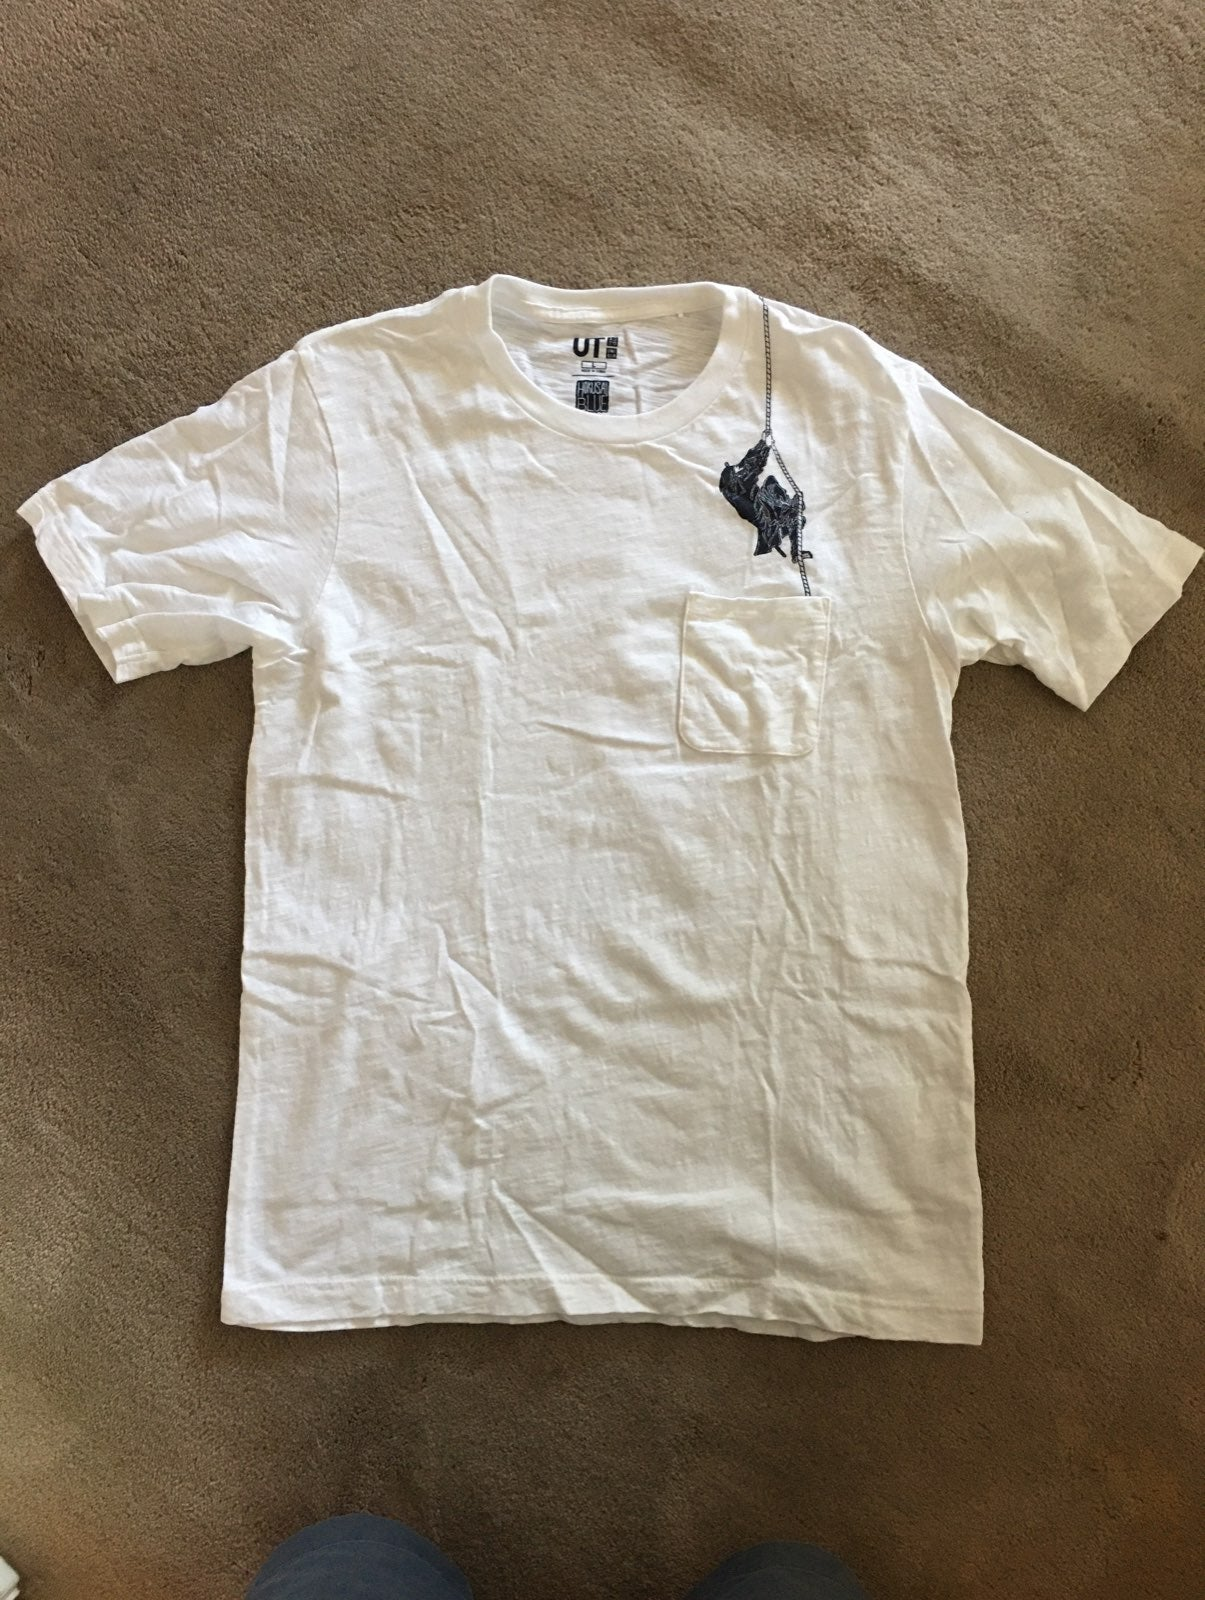 UNIQLO Samurai Shirt